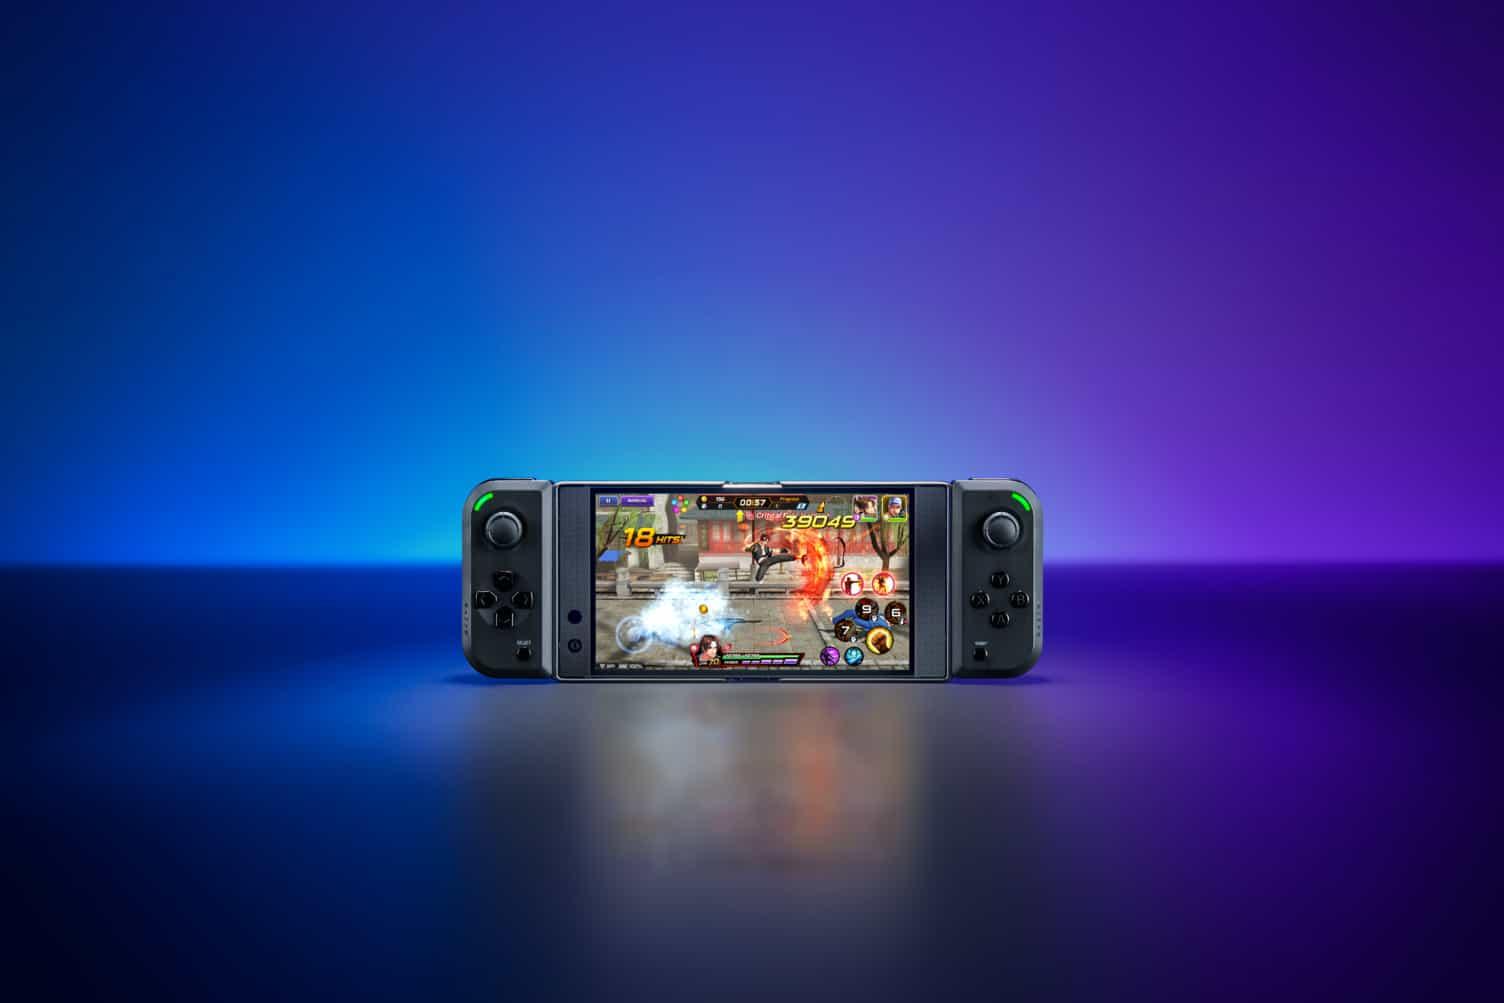 Razer Junglecat Mobile Game Controller 12